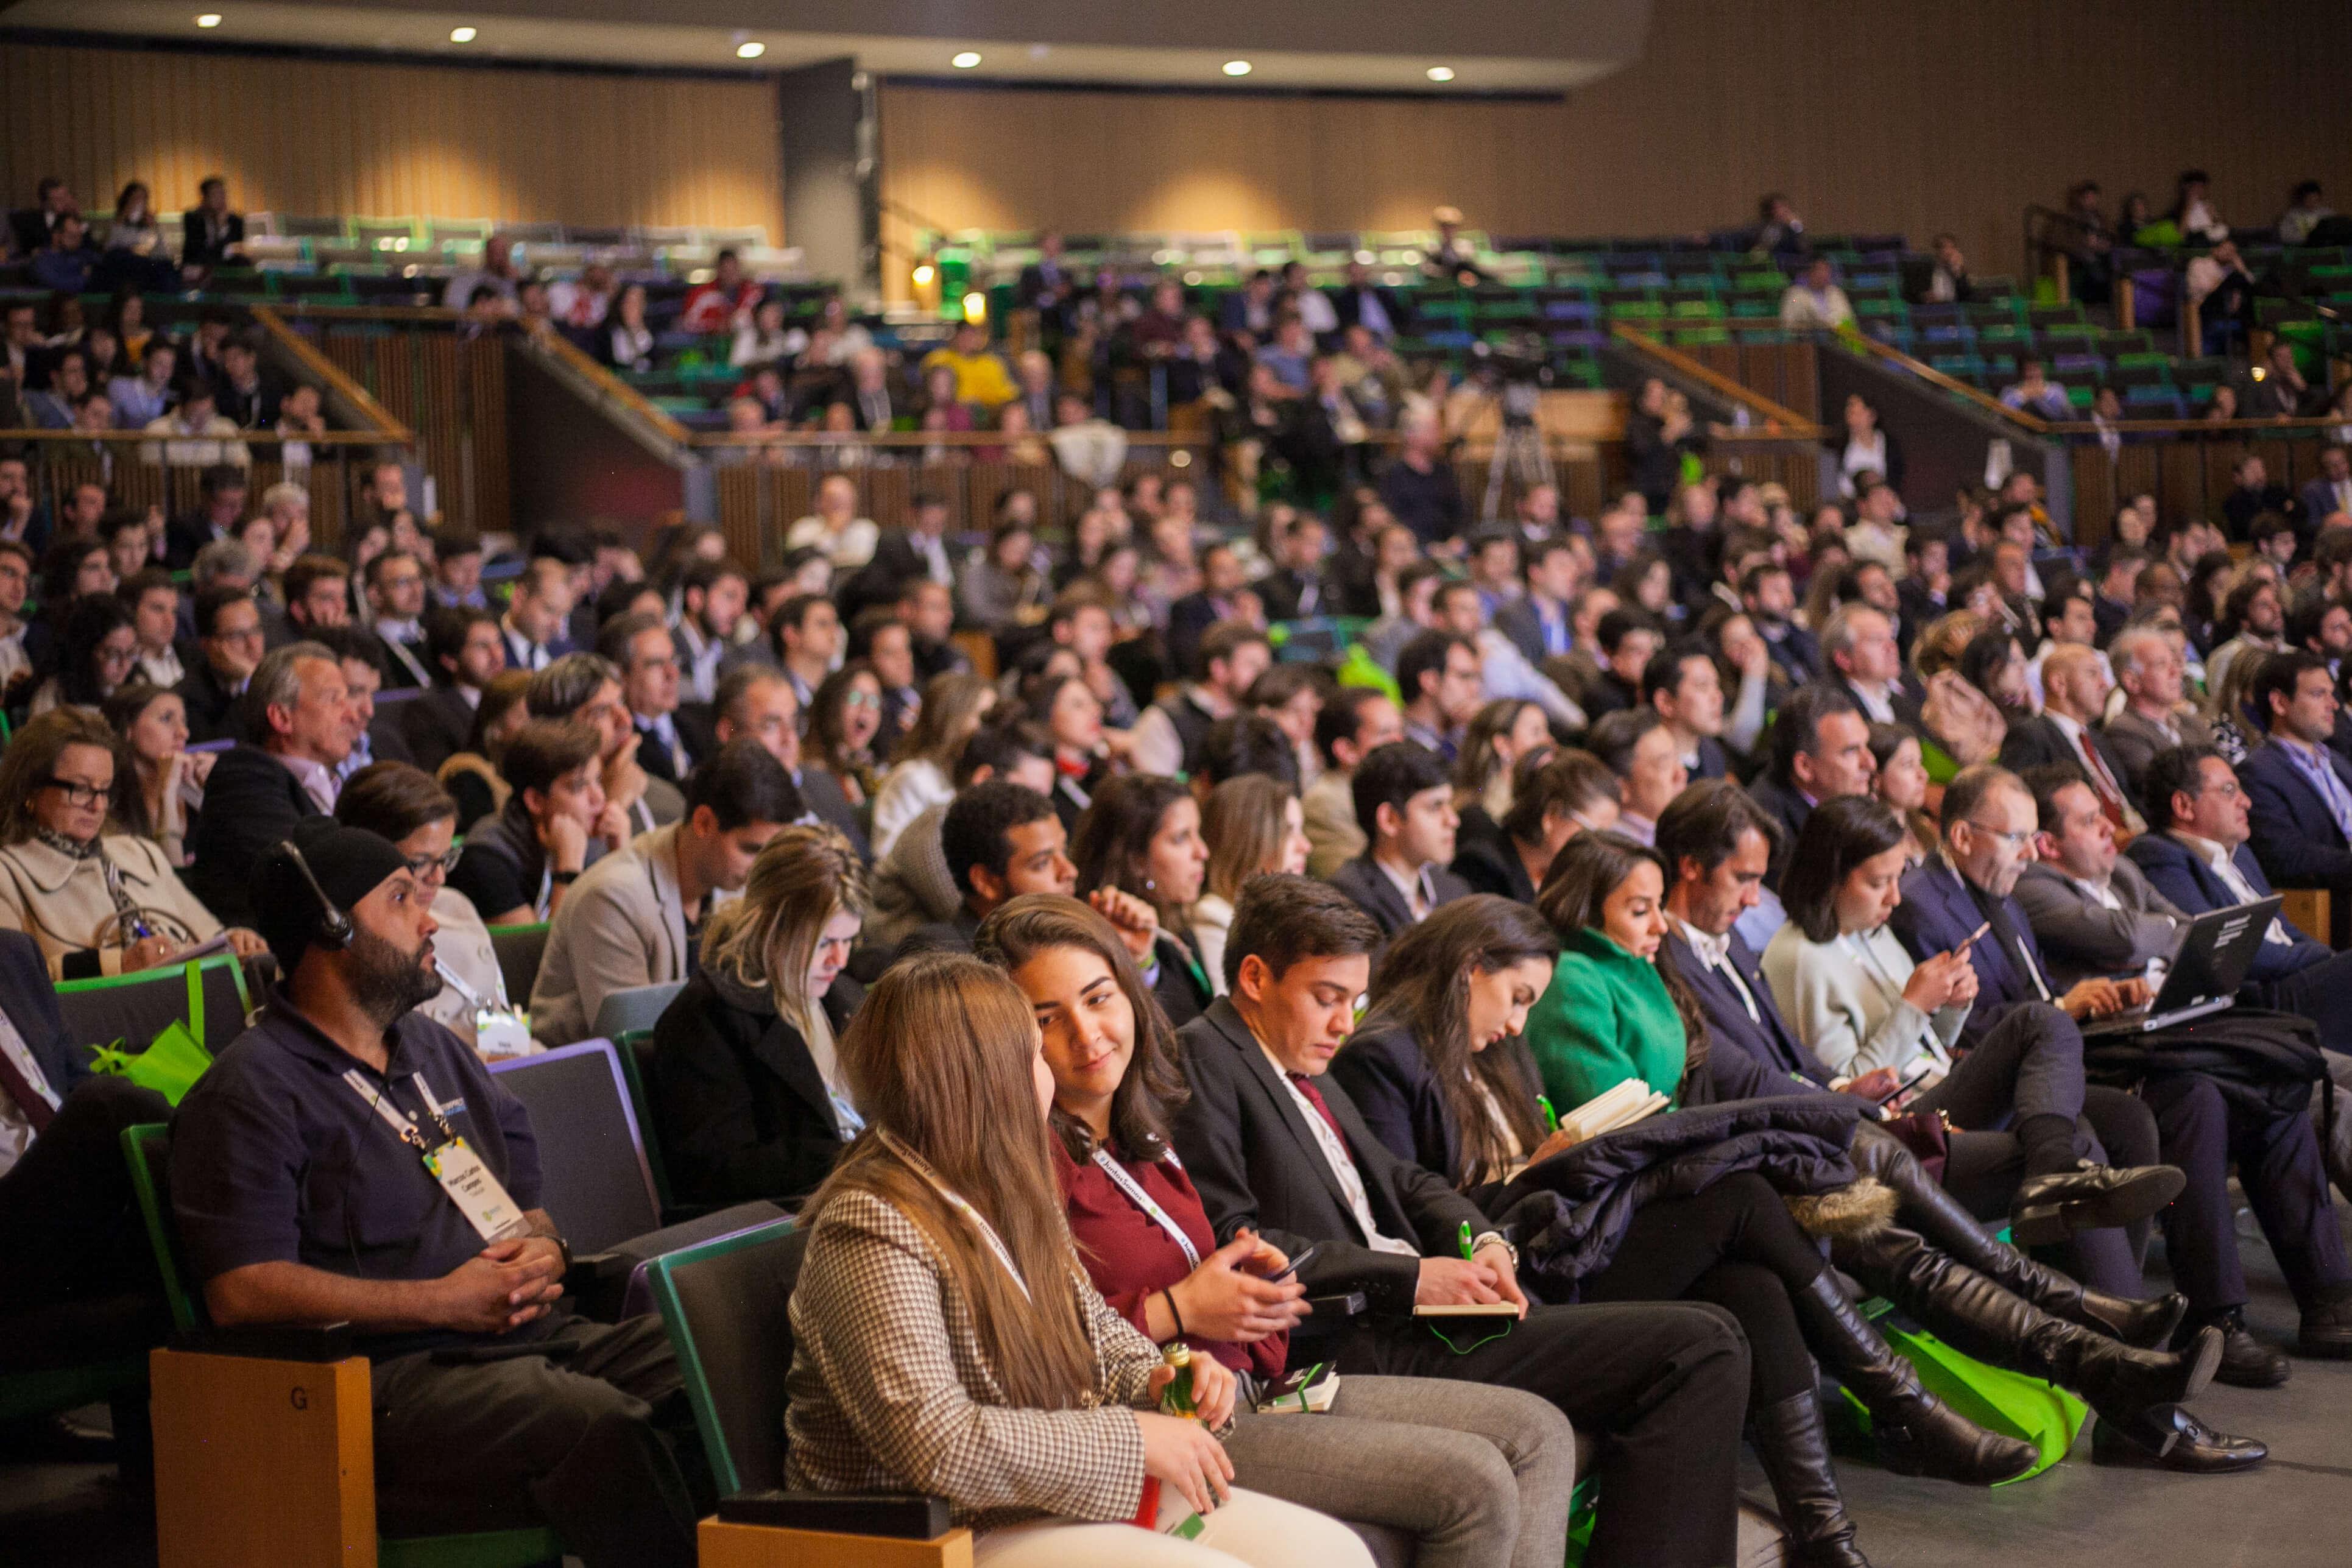 Brazil Conference - Debatendo o futuro do país